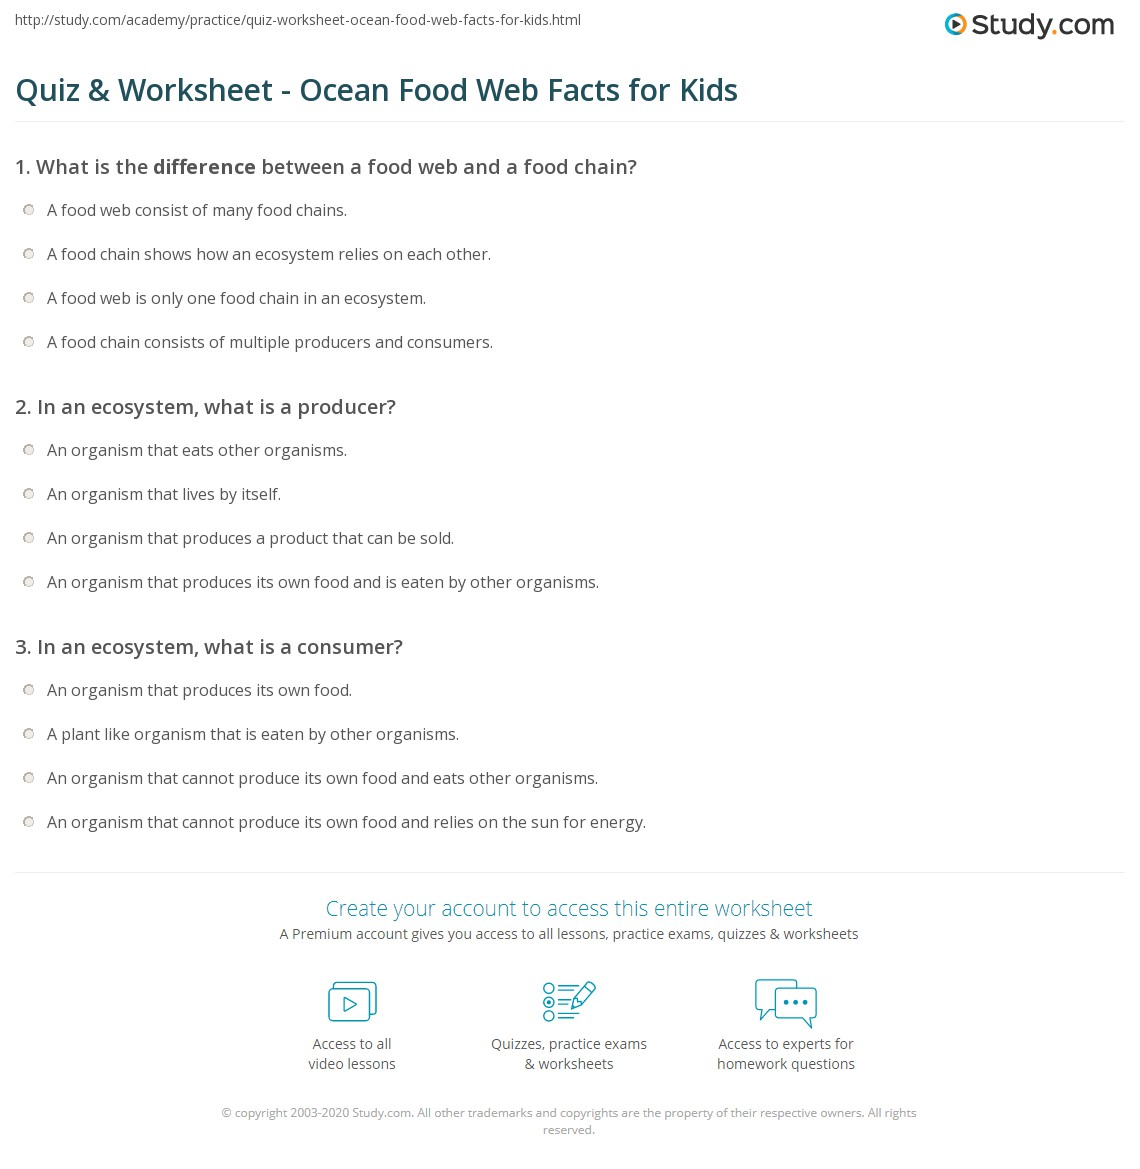 Quiz & Worksheet - Ocean Food Web Facts for Kids | Study.com